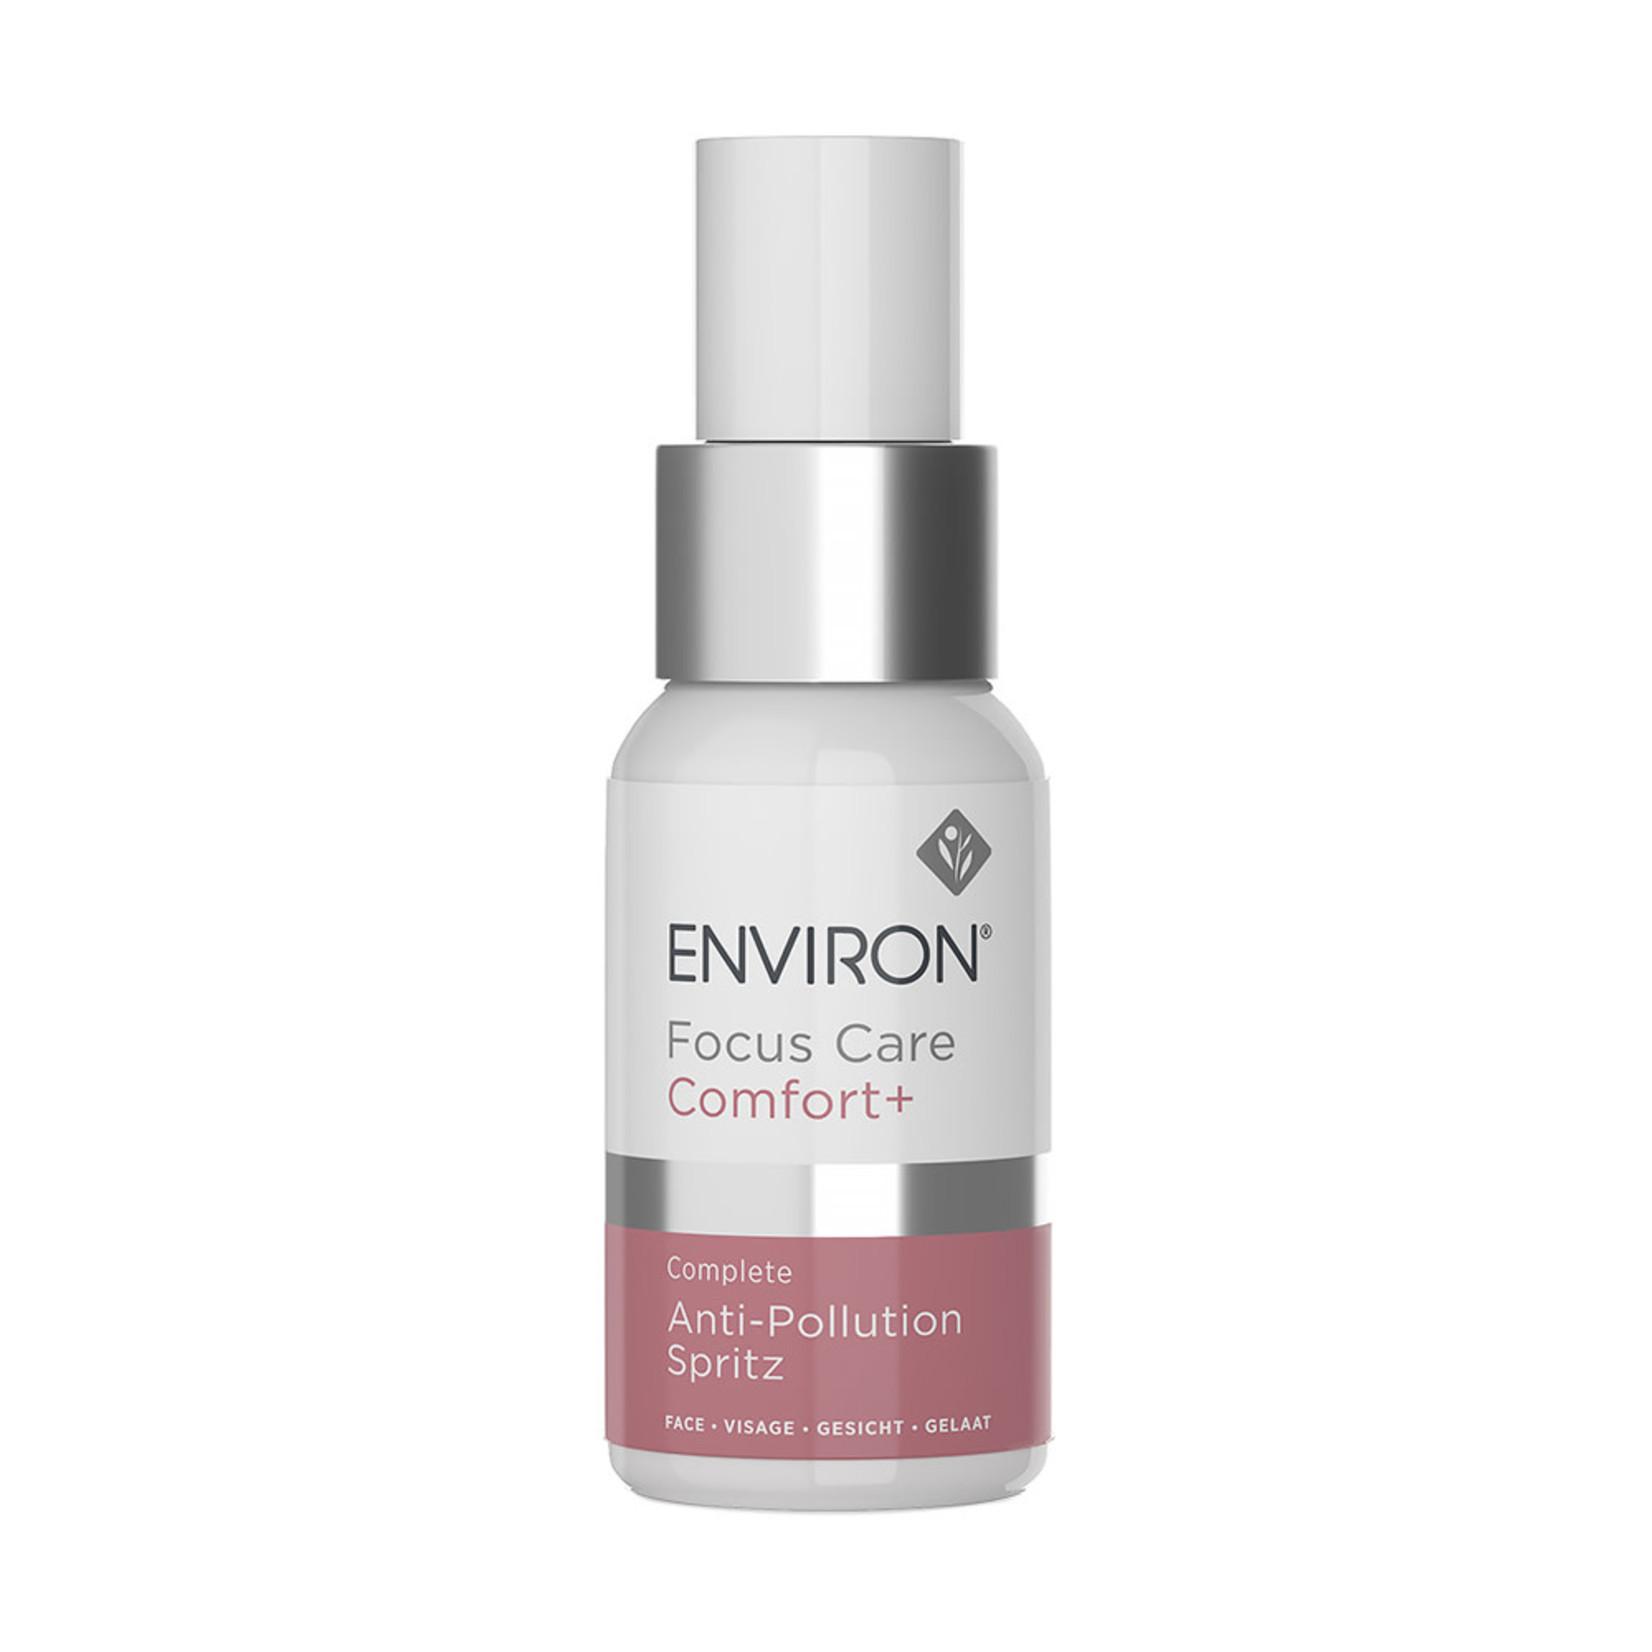 Environ Complete anti-pollution spritz 50ml